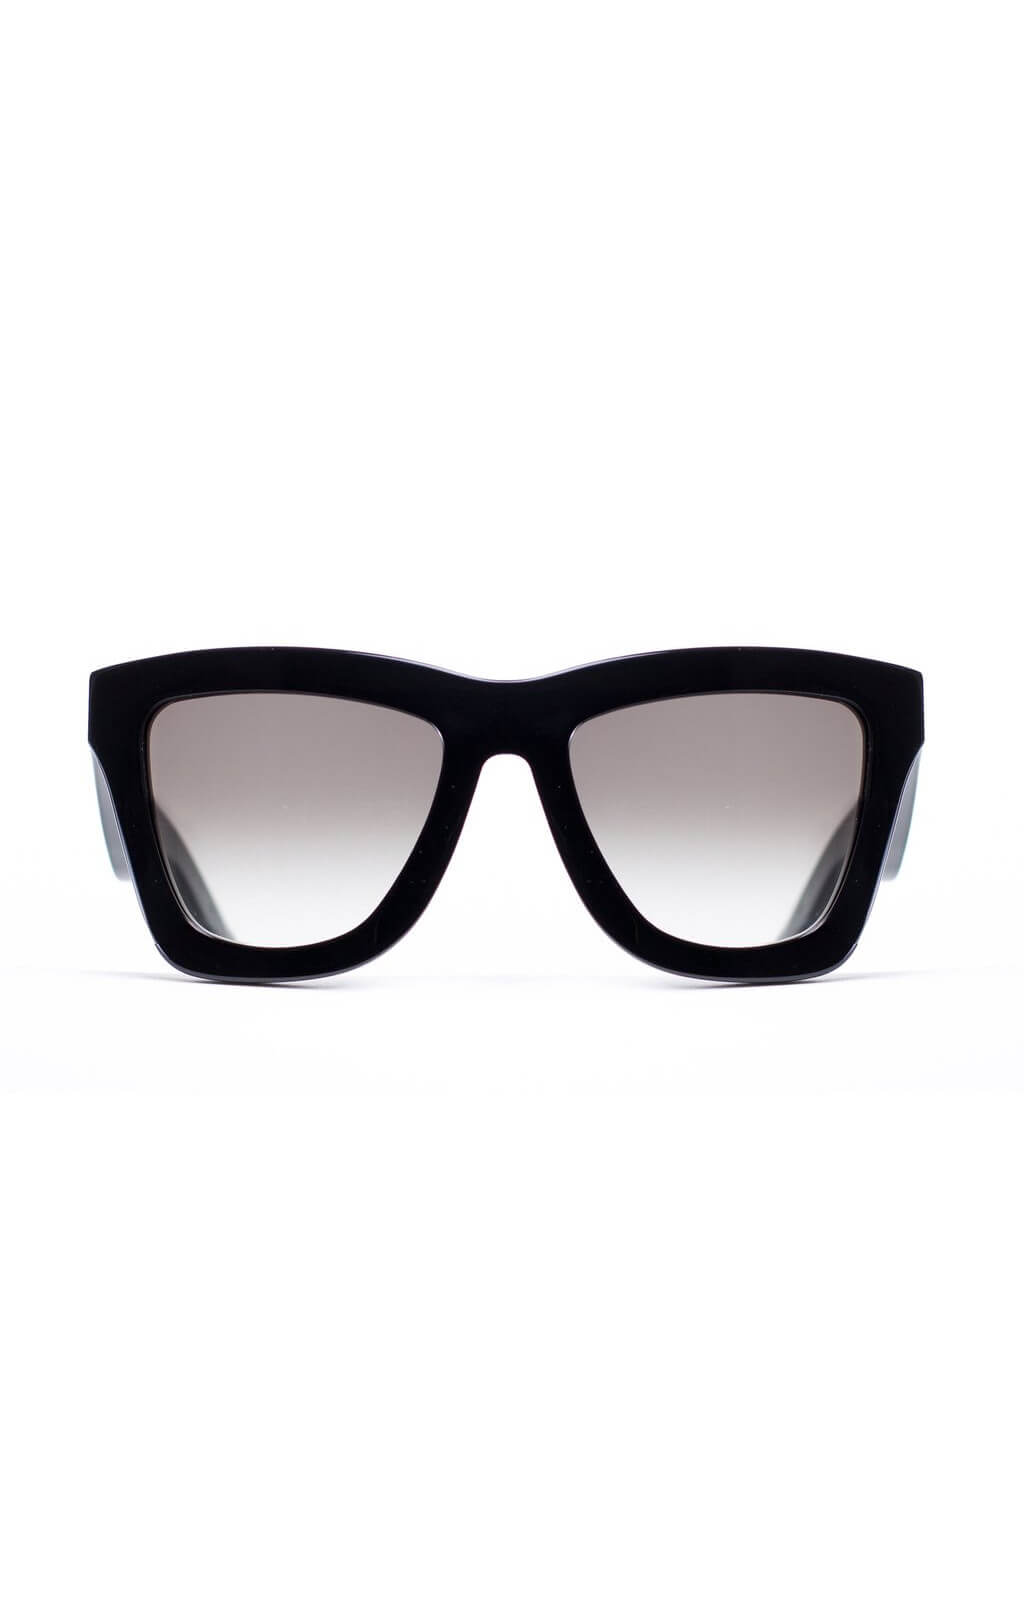 valley db sunglasses black gloss gradient lens